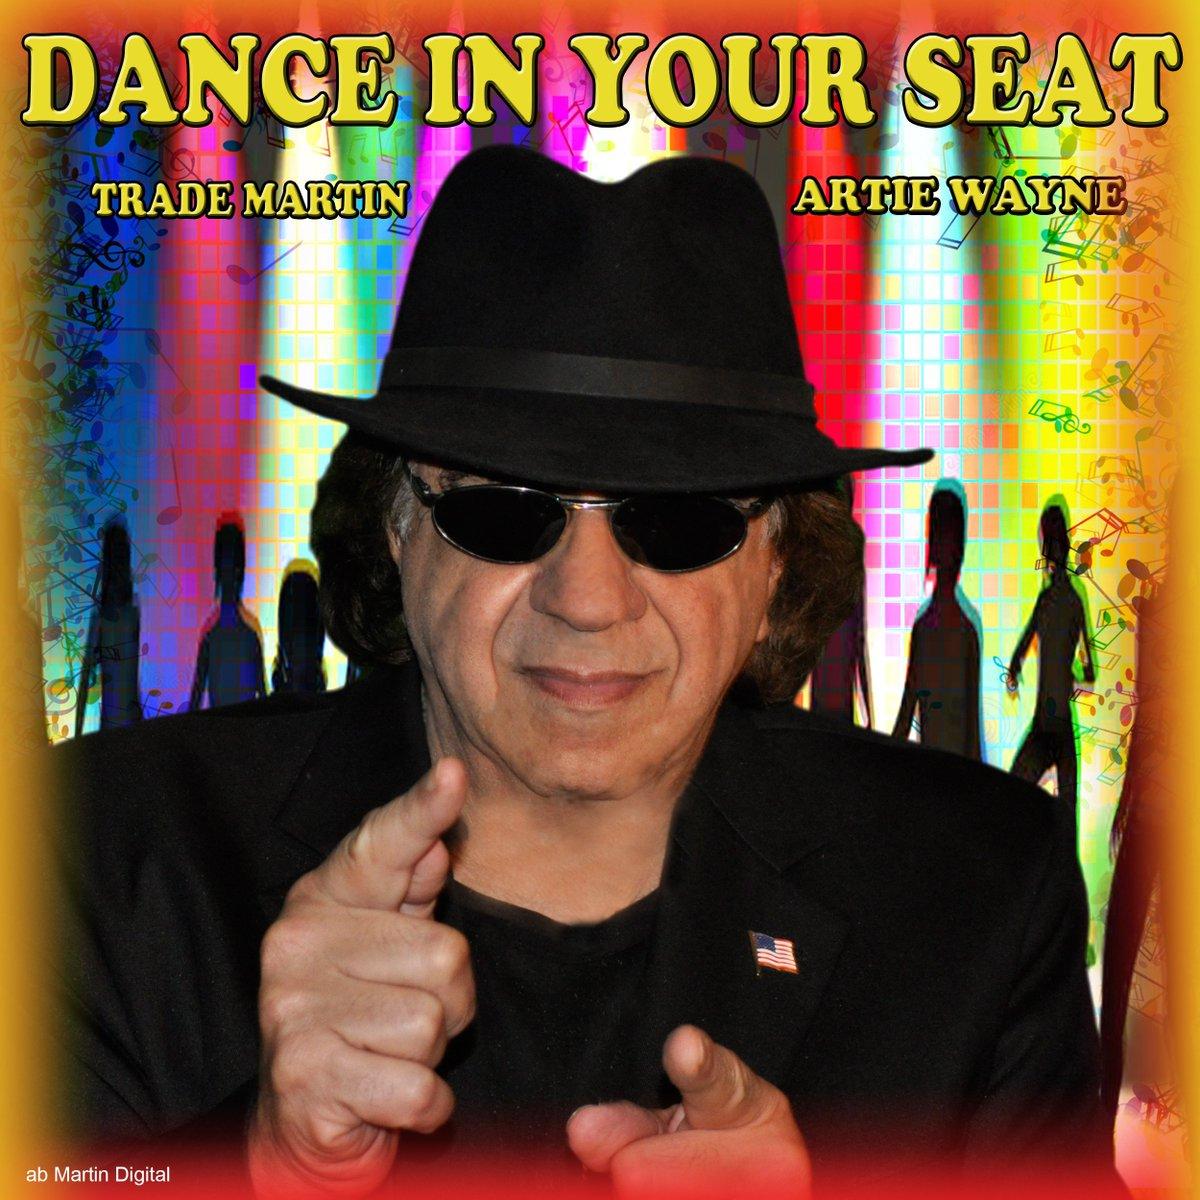 .Dance In Your Seat https://www.youtube.com/watch?v=Omaagp3_bP0… #trademartin #abMartinDigital #iTunes #Amazon #Spotify #AppleMusic #Pandora #ArtieWayne